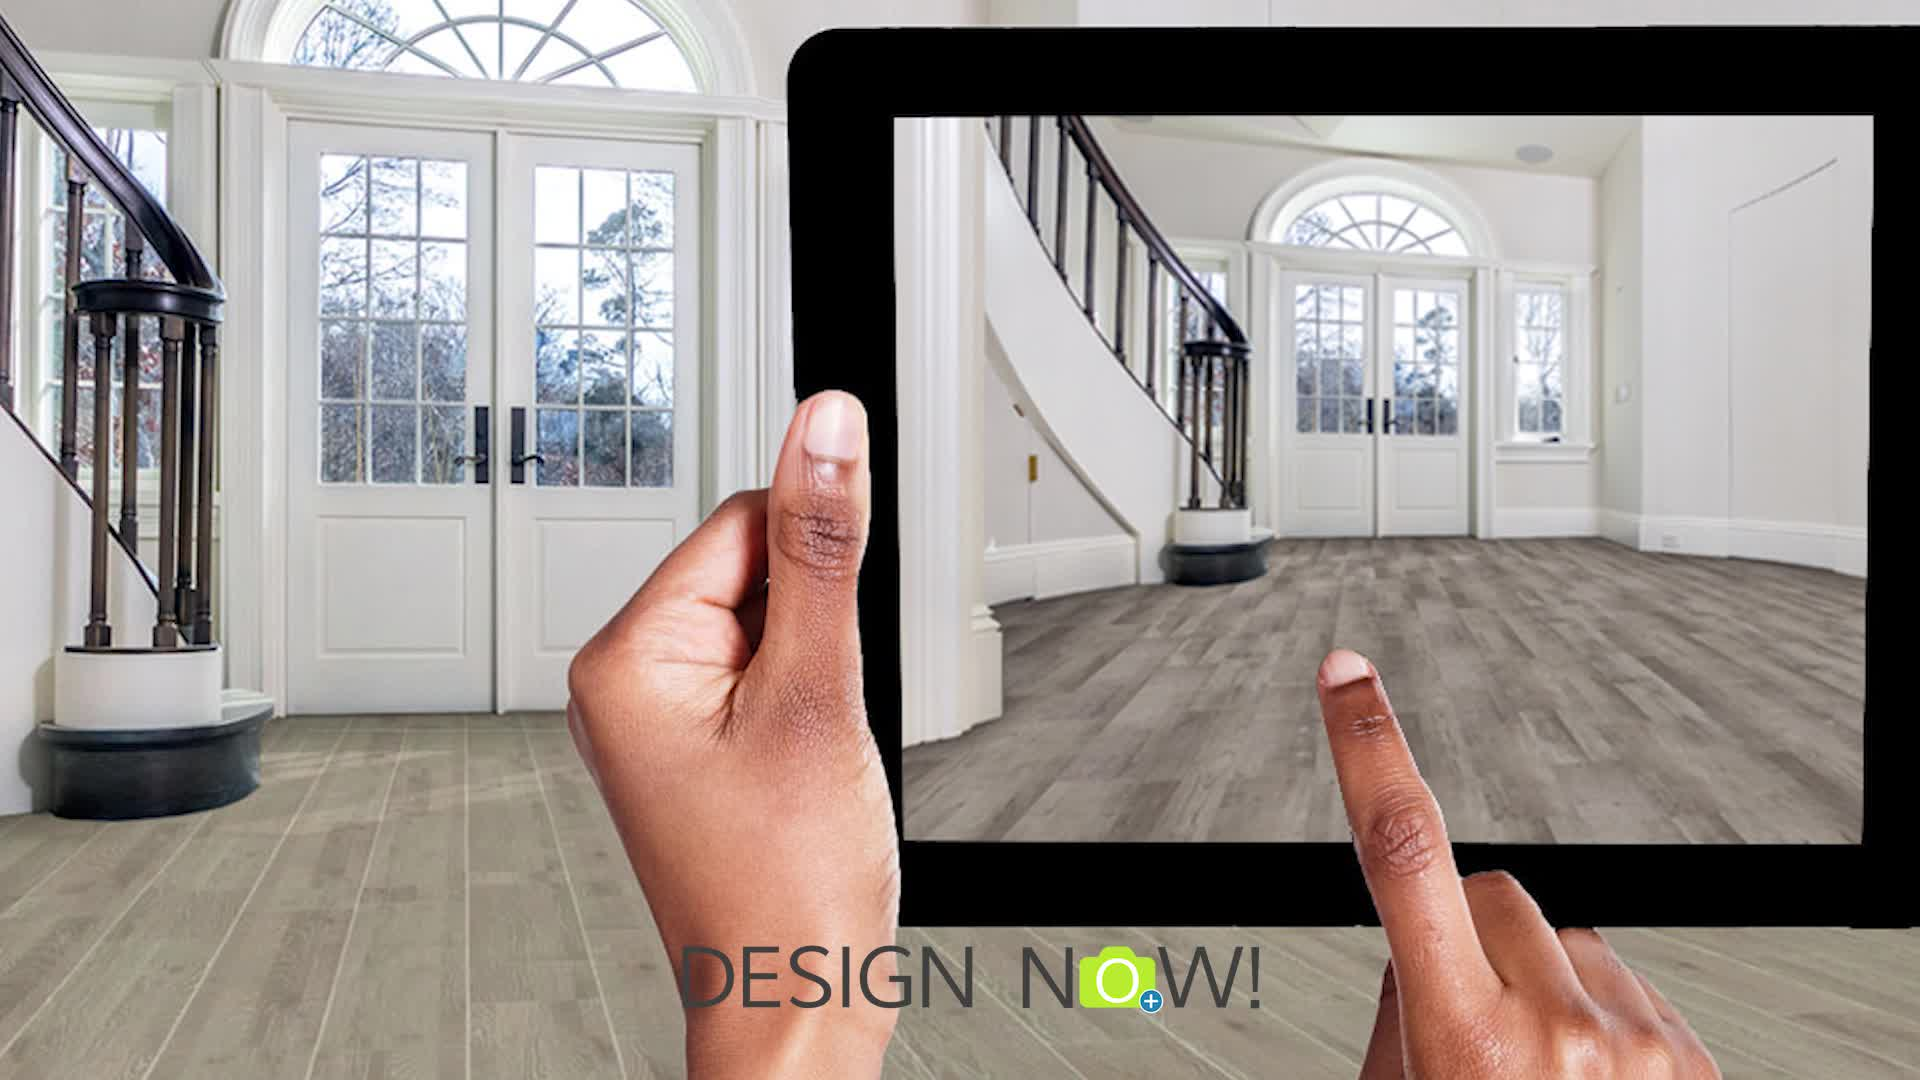 Design Now with Levi's 4 Floors